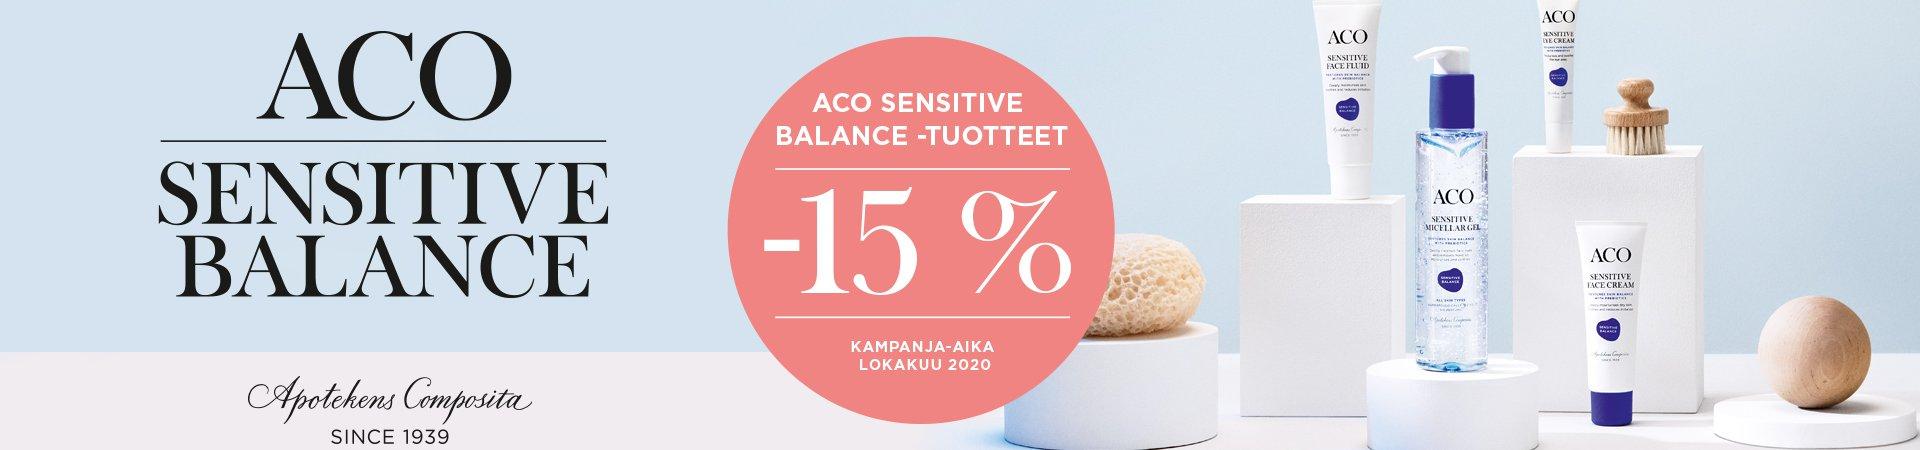 ACO Sensitive Balance